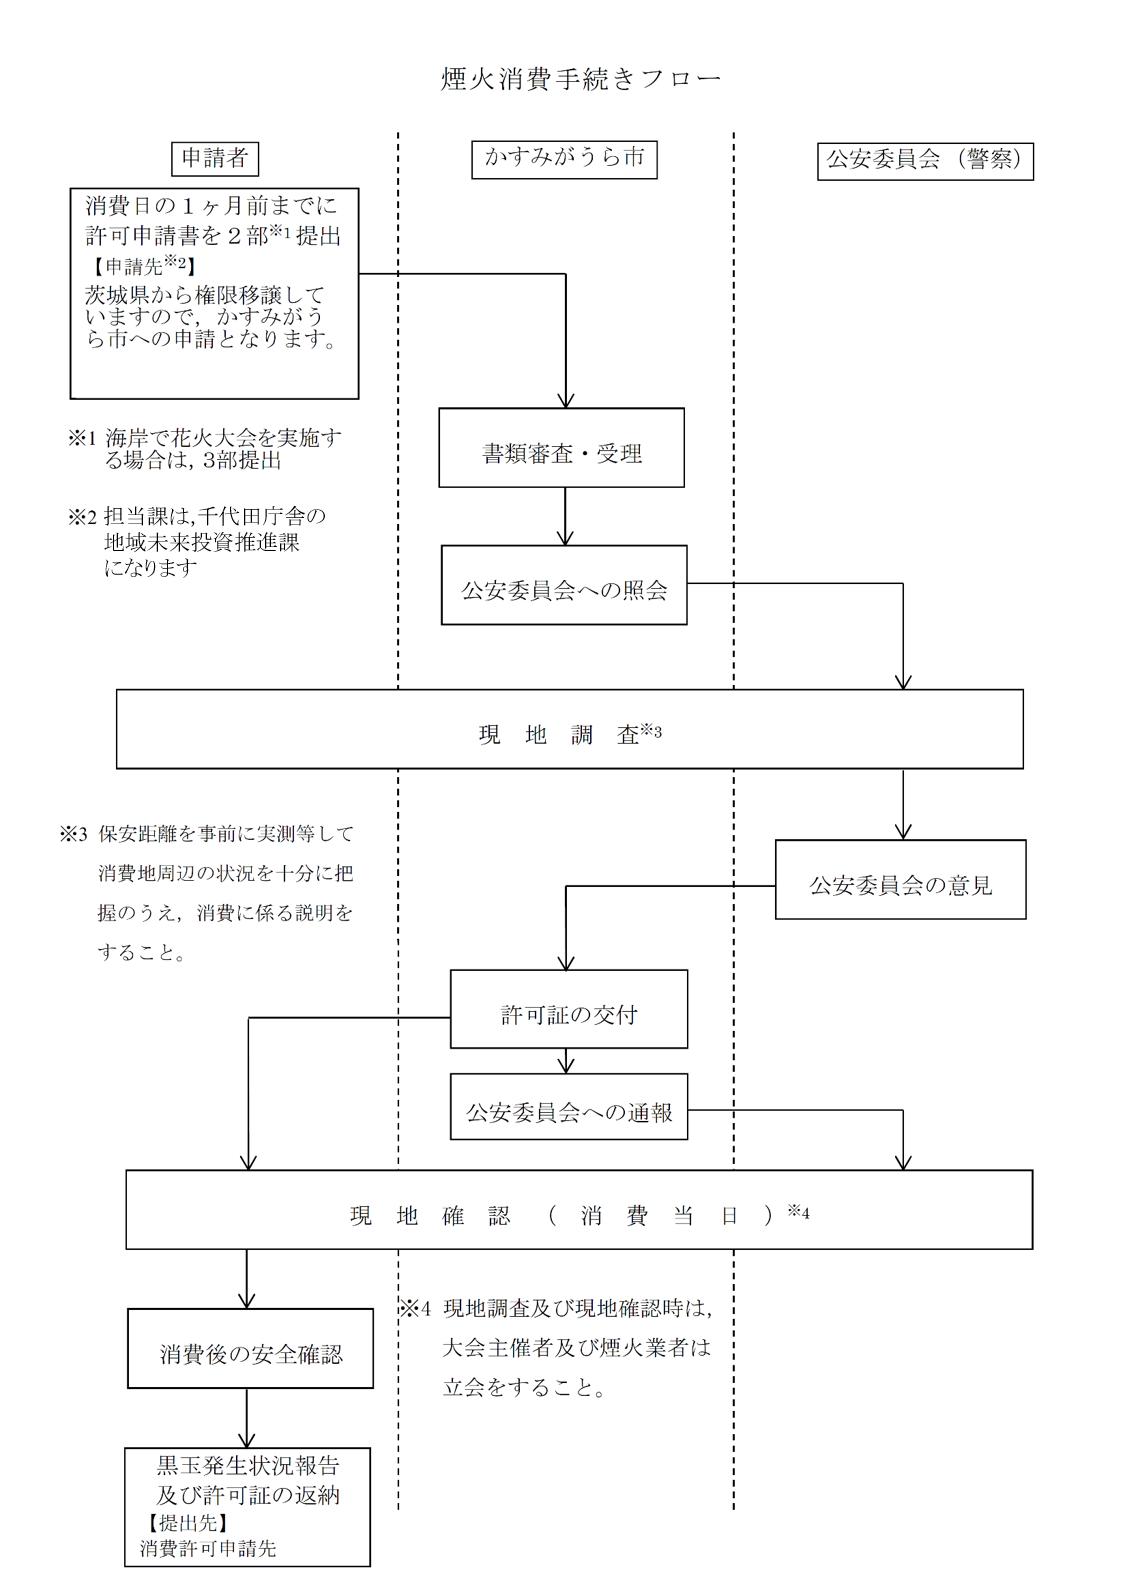 煙火消費手続きフロー(地域未来版)